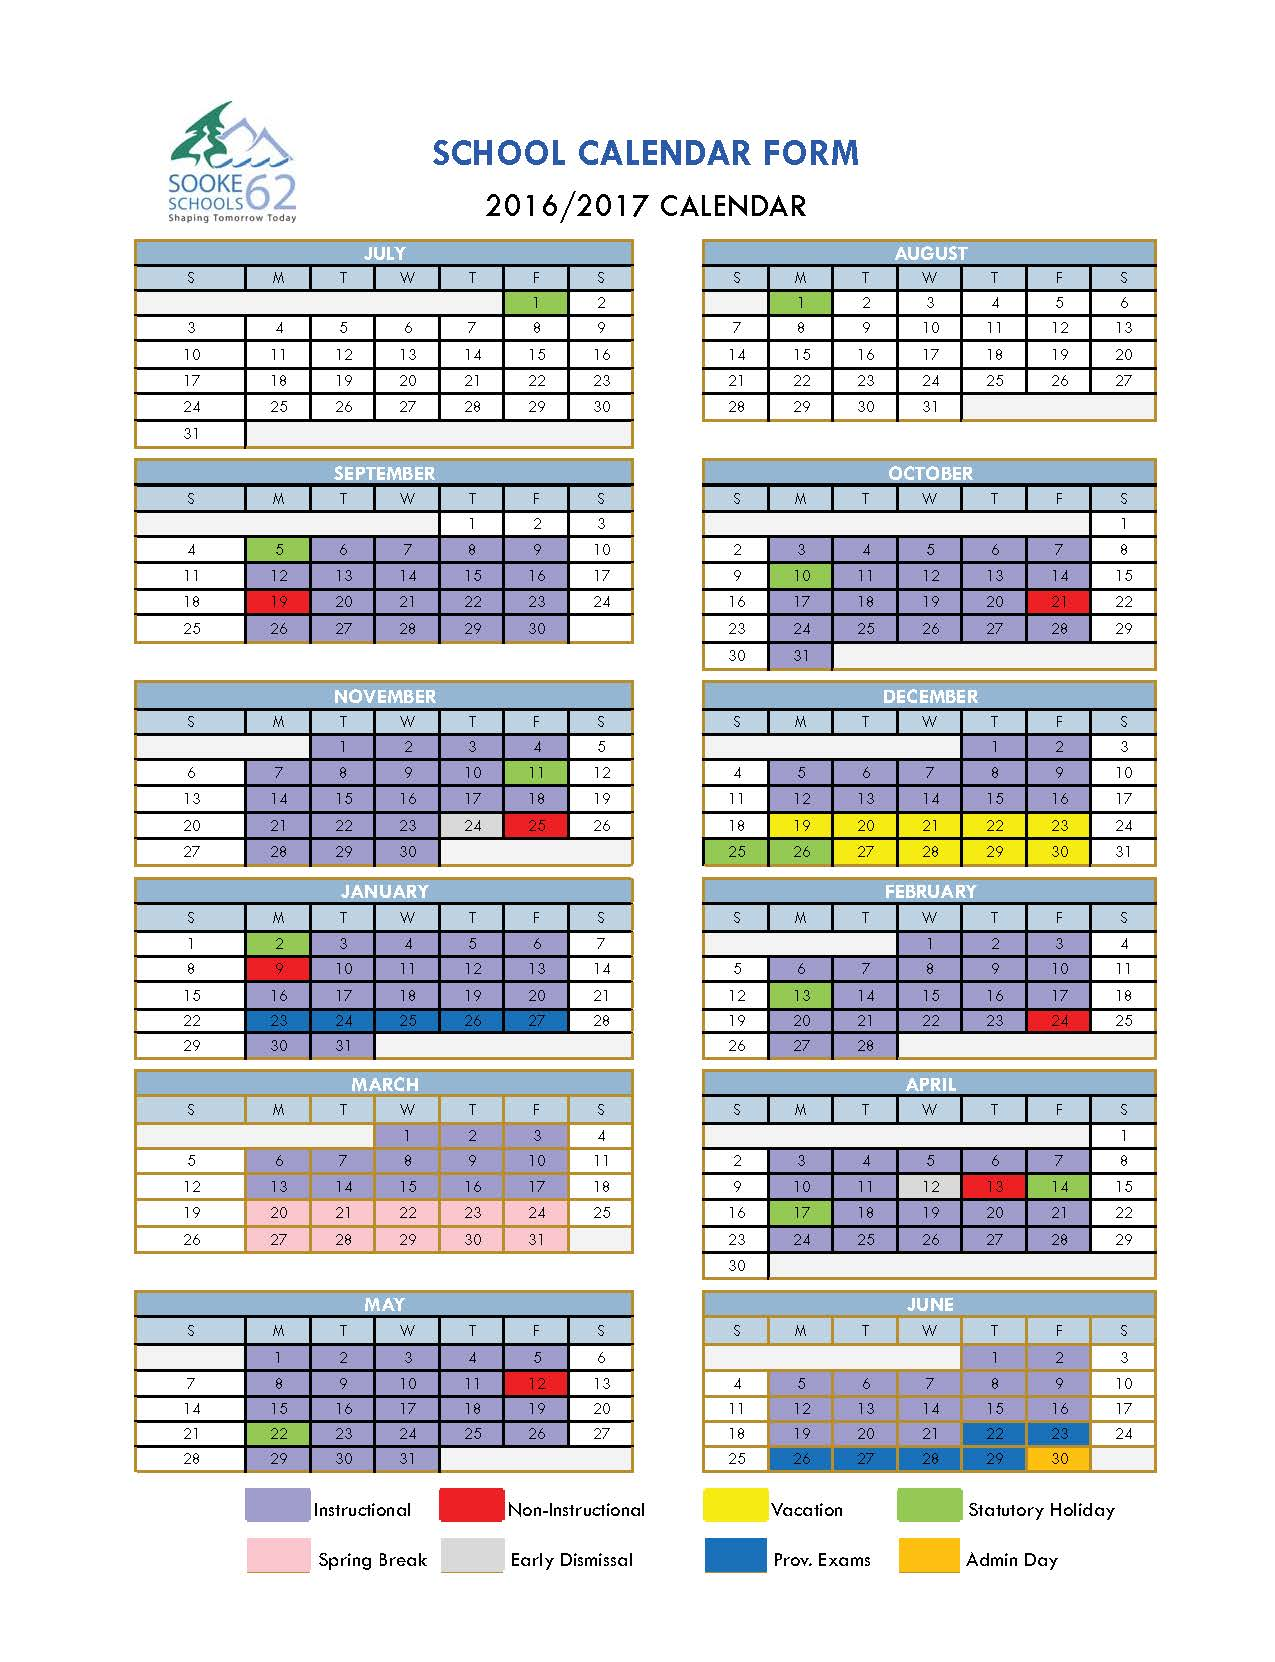 Calendars_2016-17